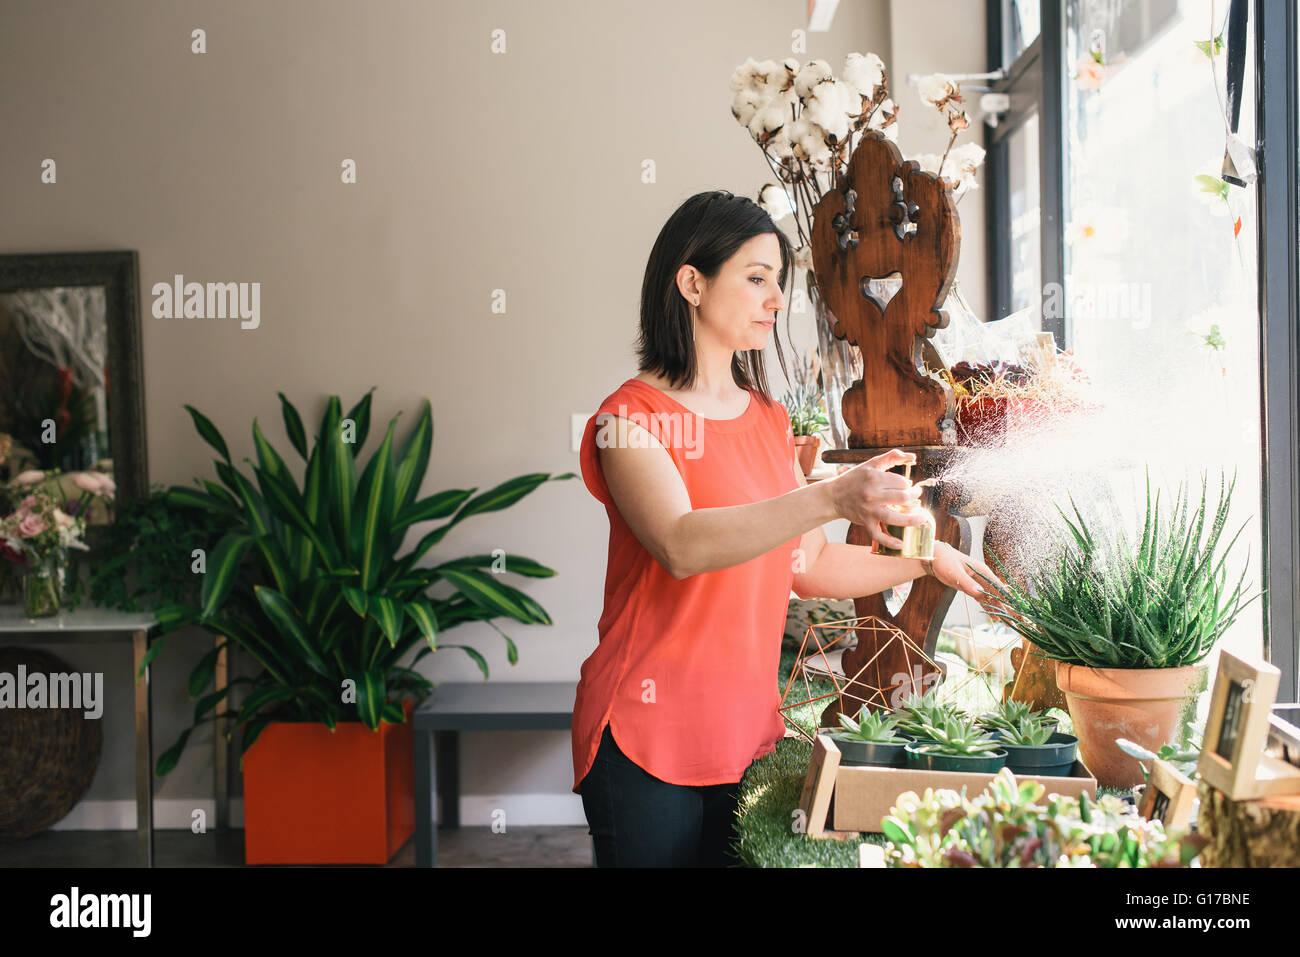 Florist watering plants in flower shop - Stock Image